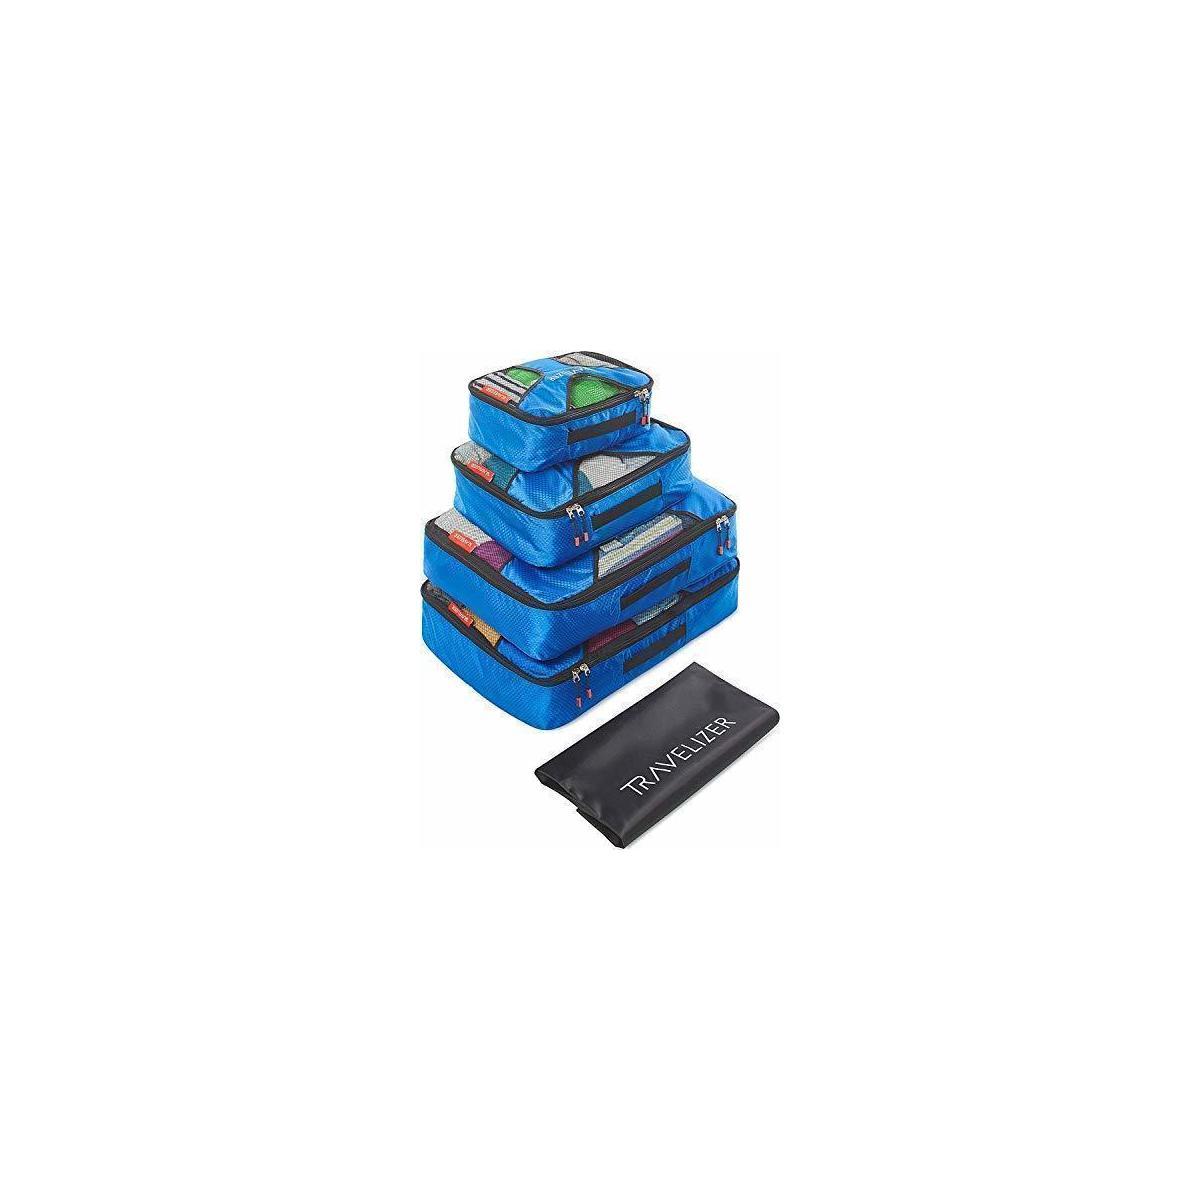 Travel Packing Cubes 5pcs Luggage Organizer Set for Bag /& Suitcase Travelizer